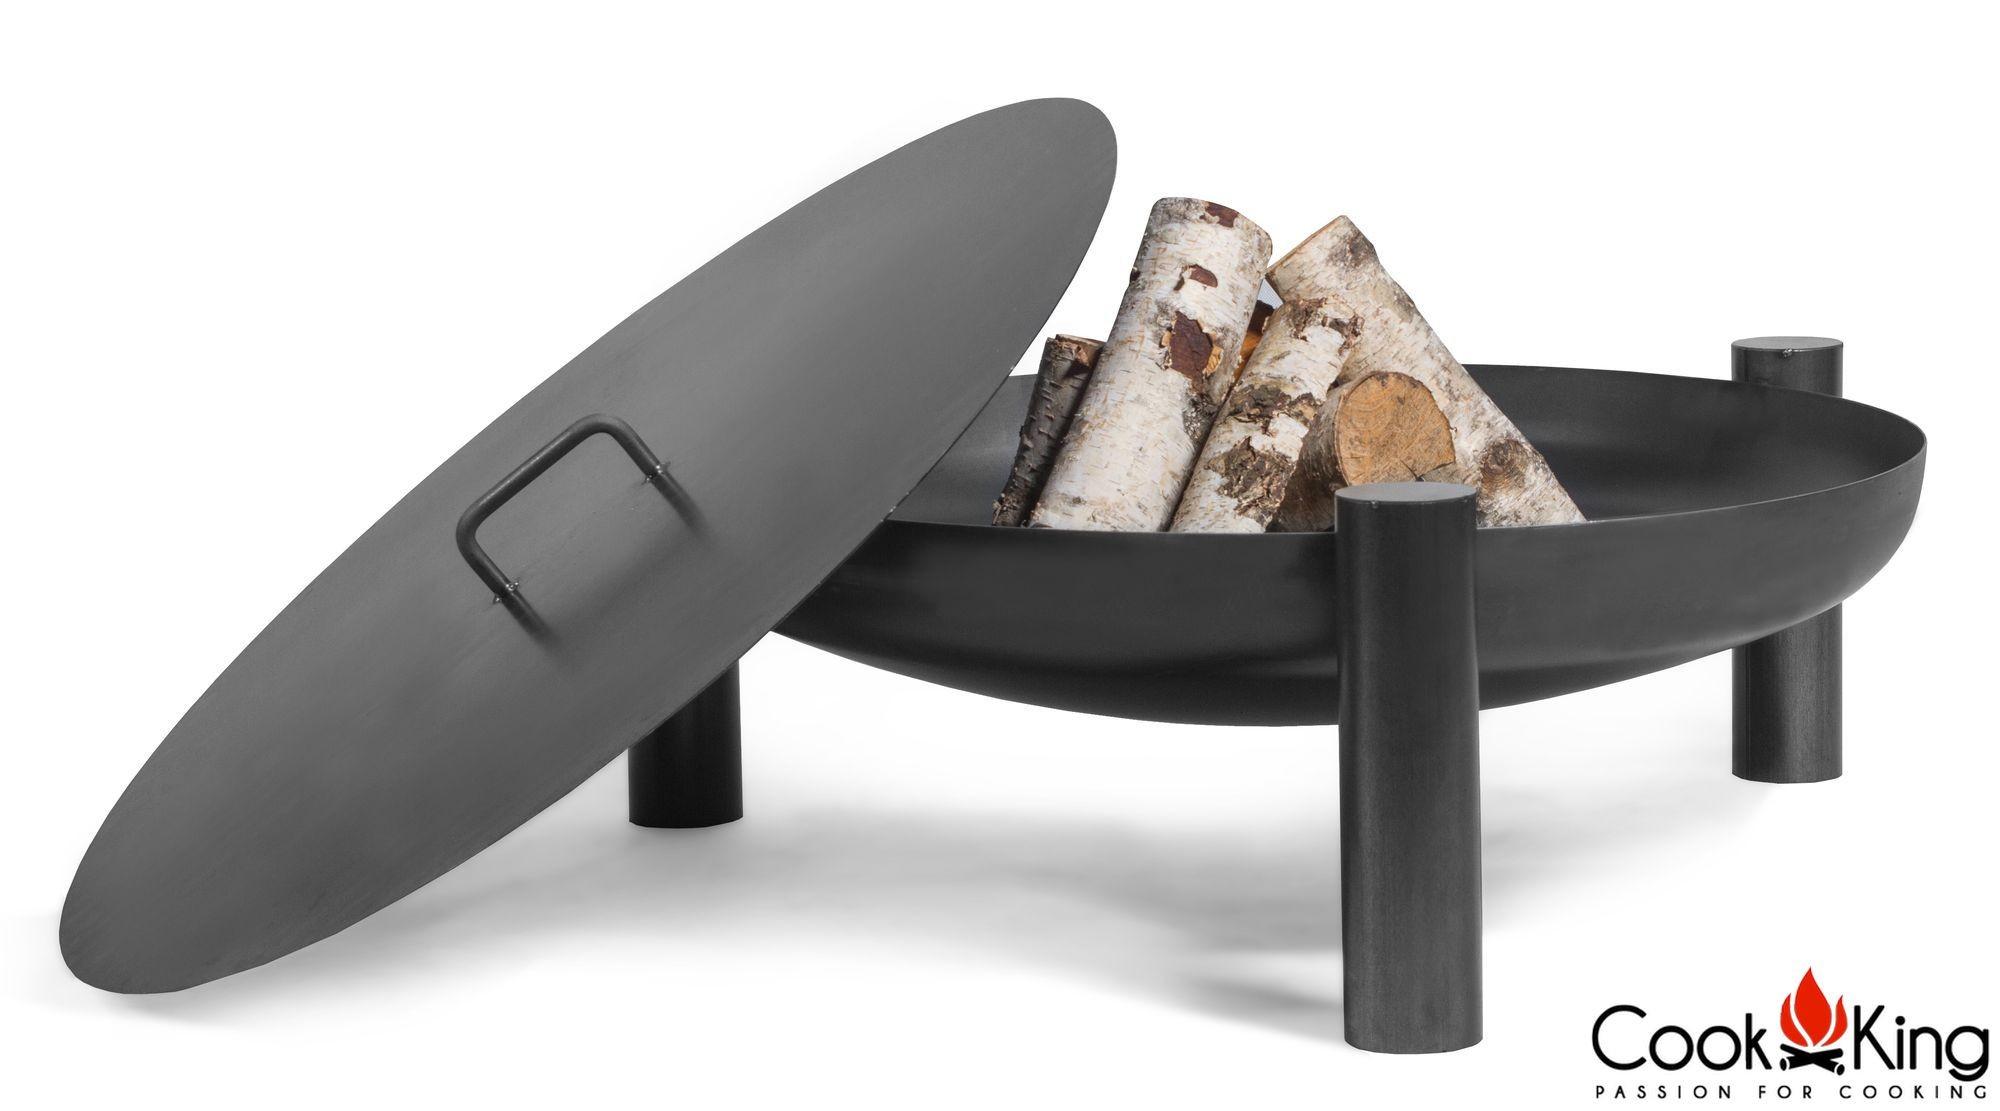 cookking store markenshop f r feuer und grillprodukte. Black Bedroom Furniture Sets. Home Design Ideas